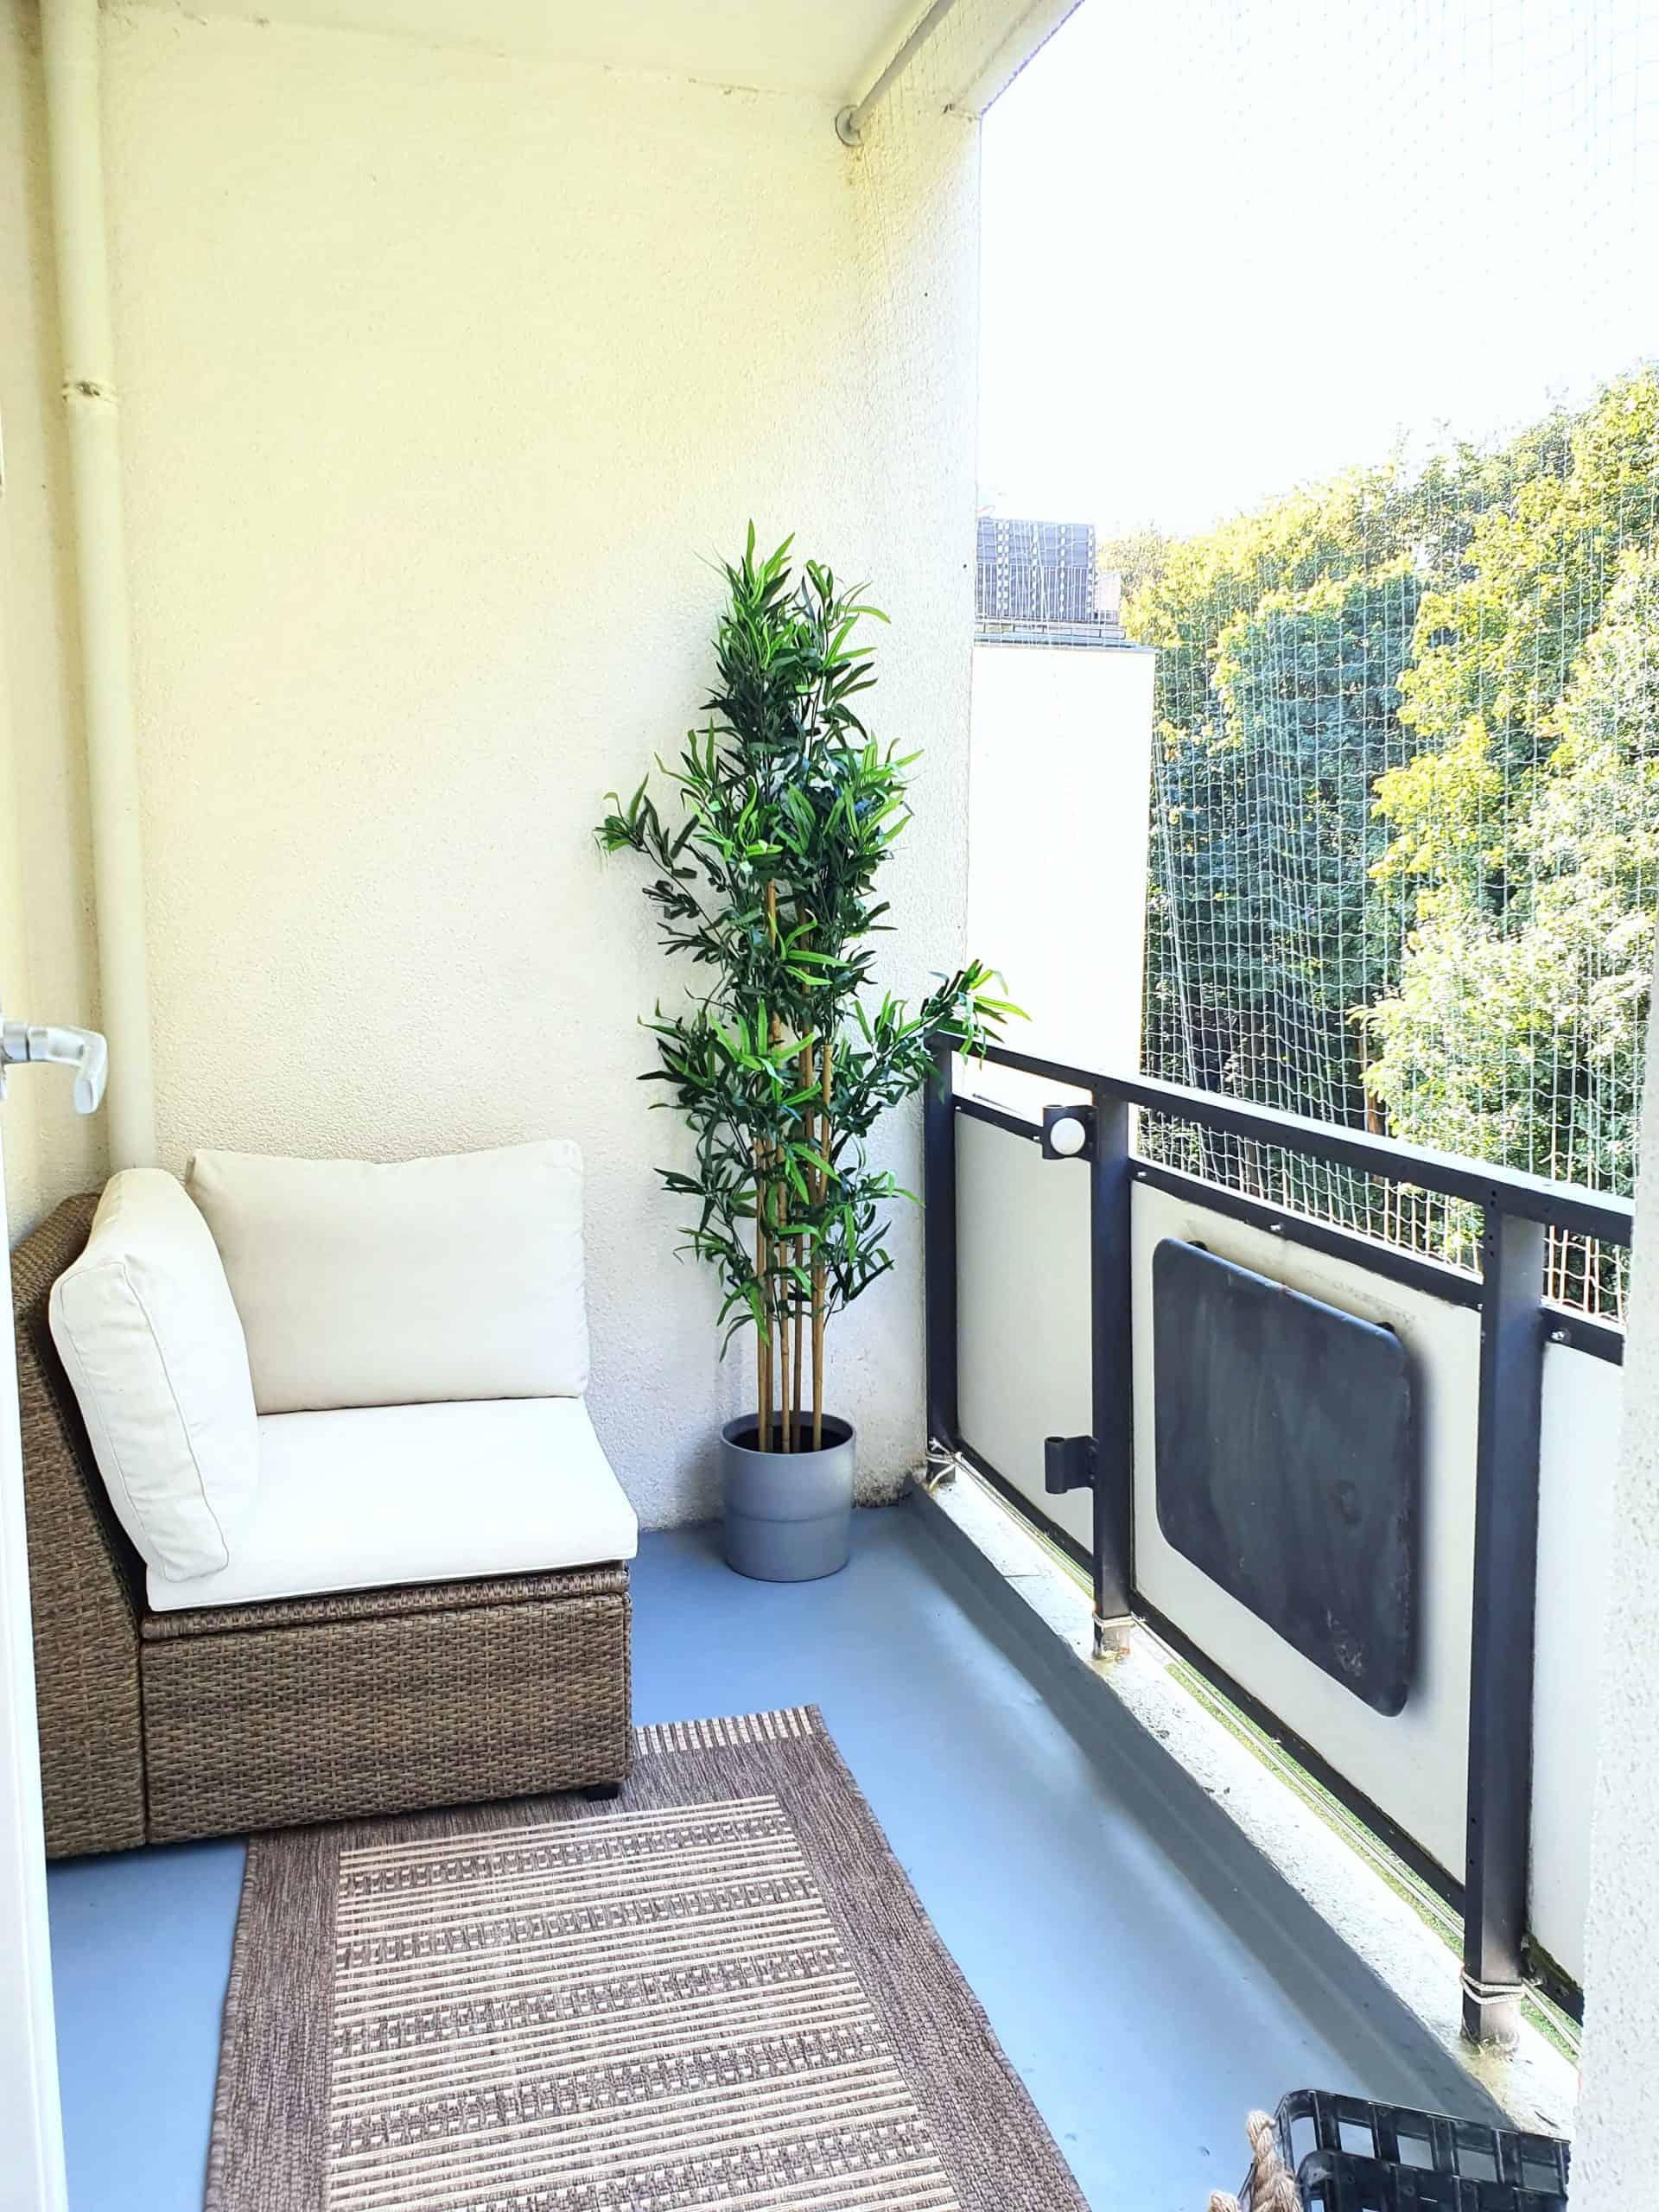 Provisionsfrei: 1 Zimmer Wohnung nahe UKE, Balkon